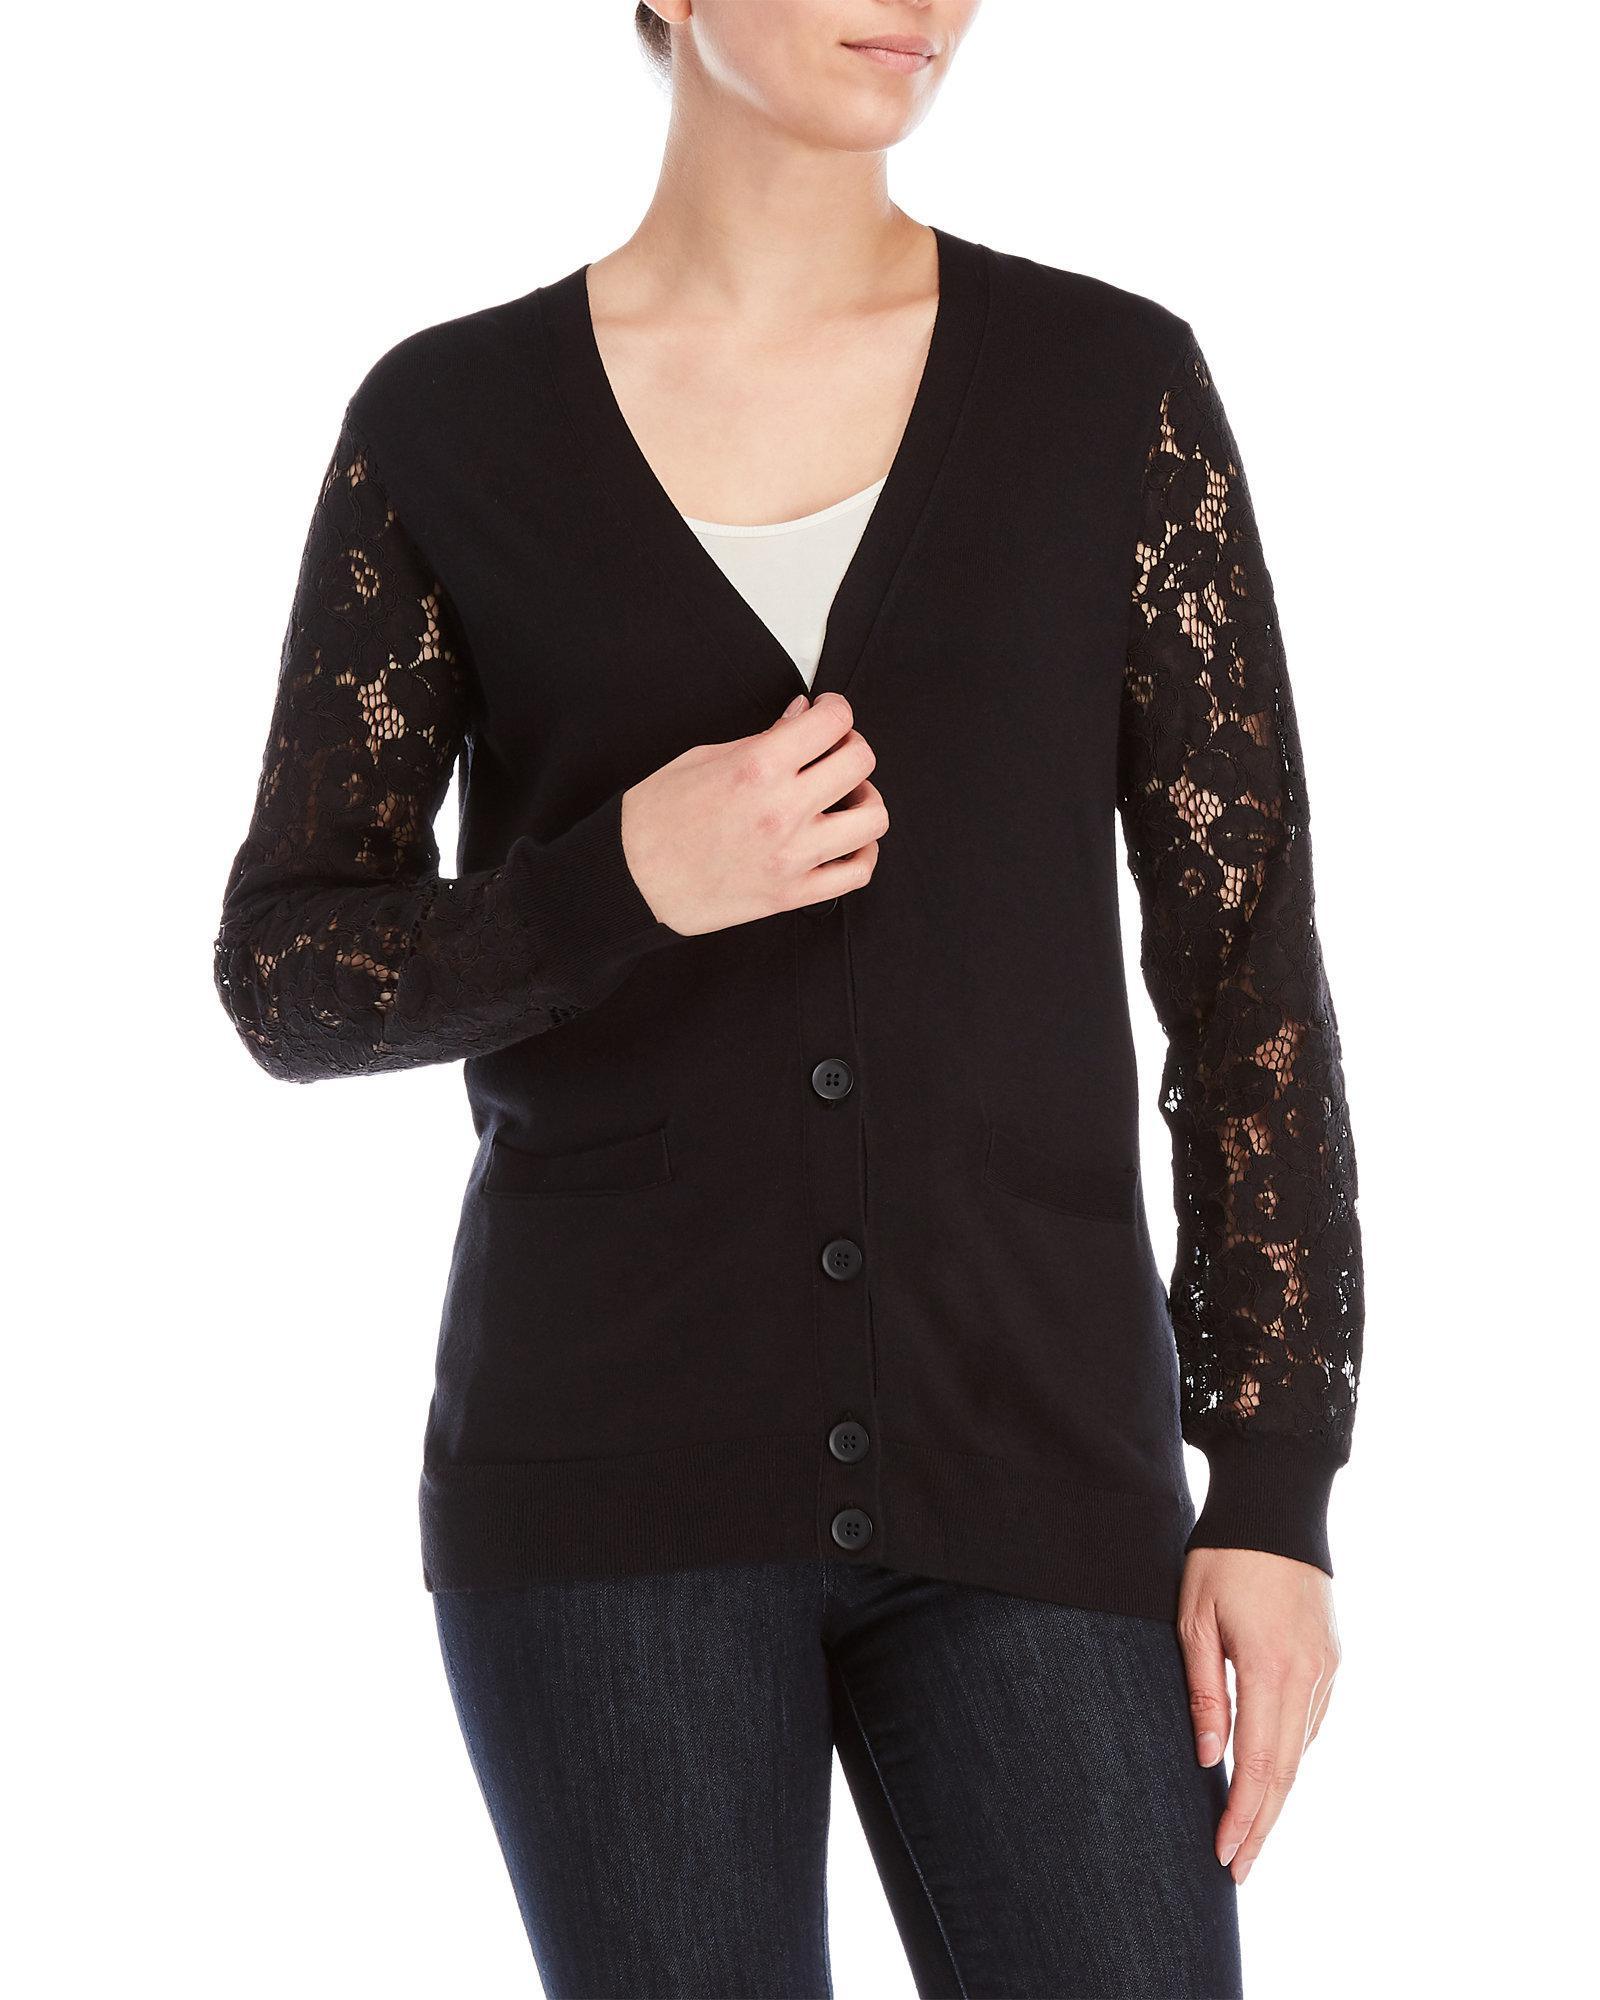 Dkny Lace Sleeve Cardigan in Black   Lyst